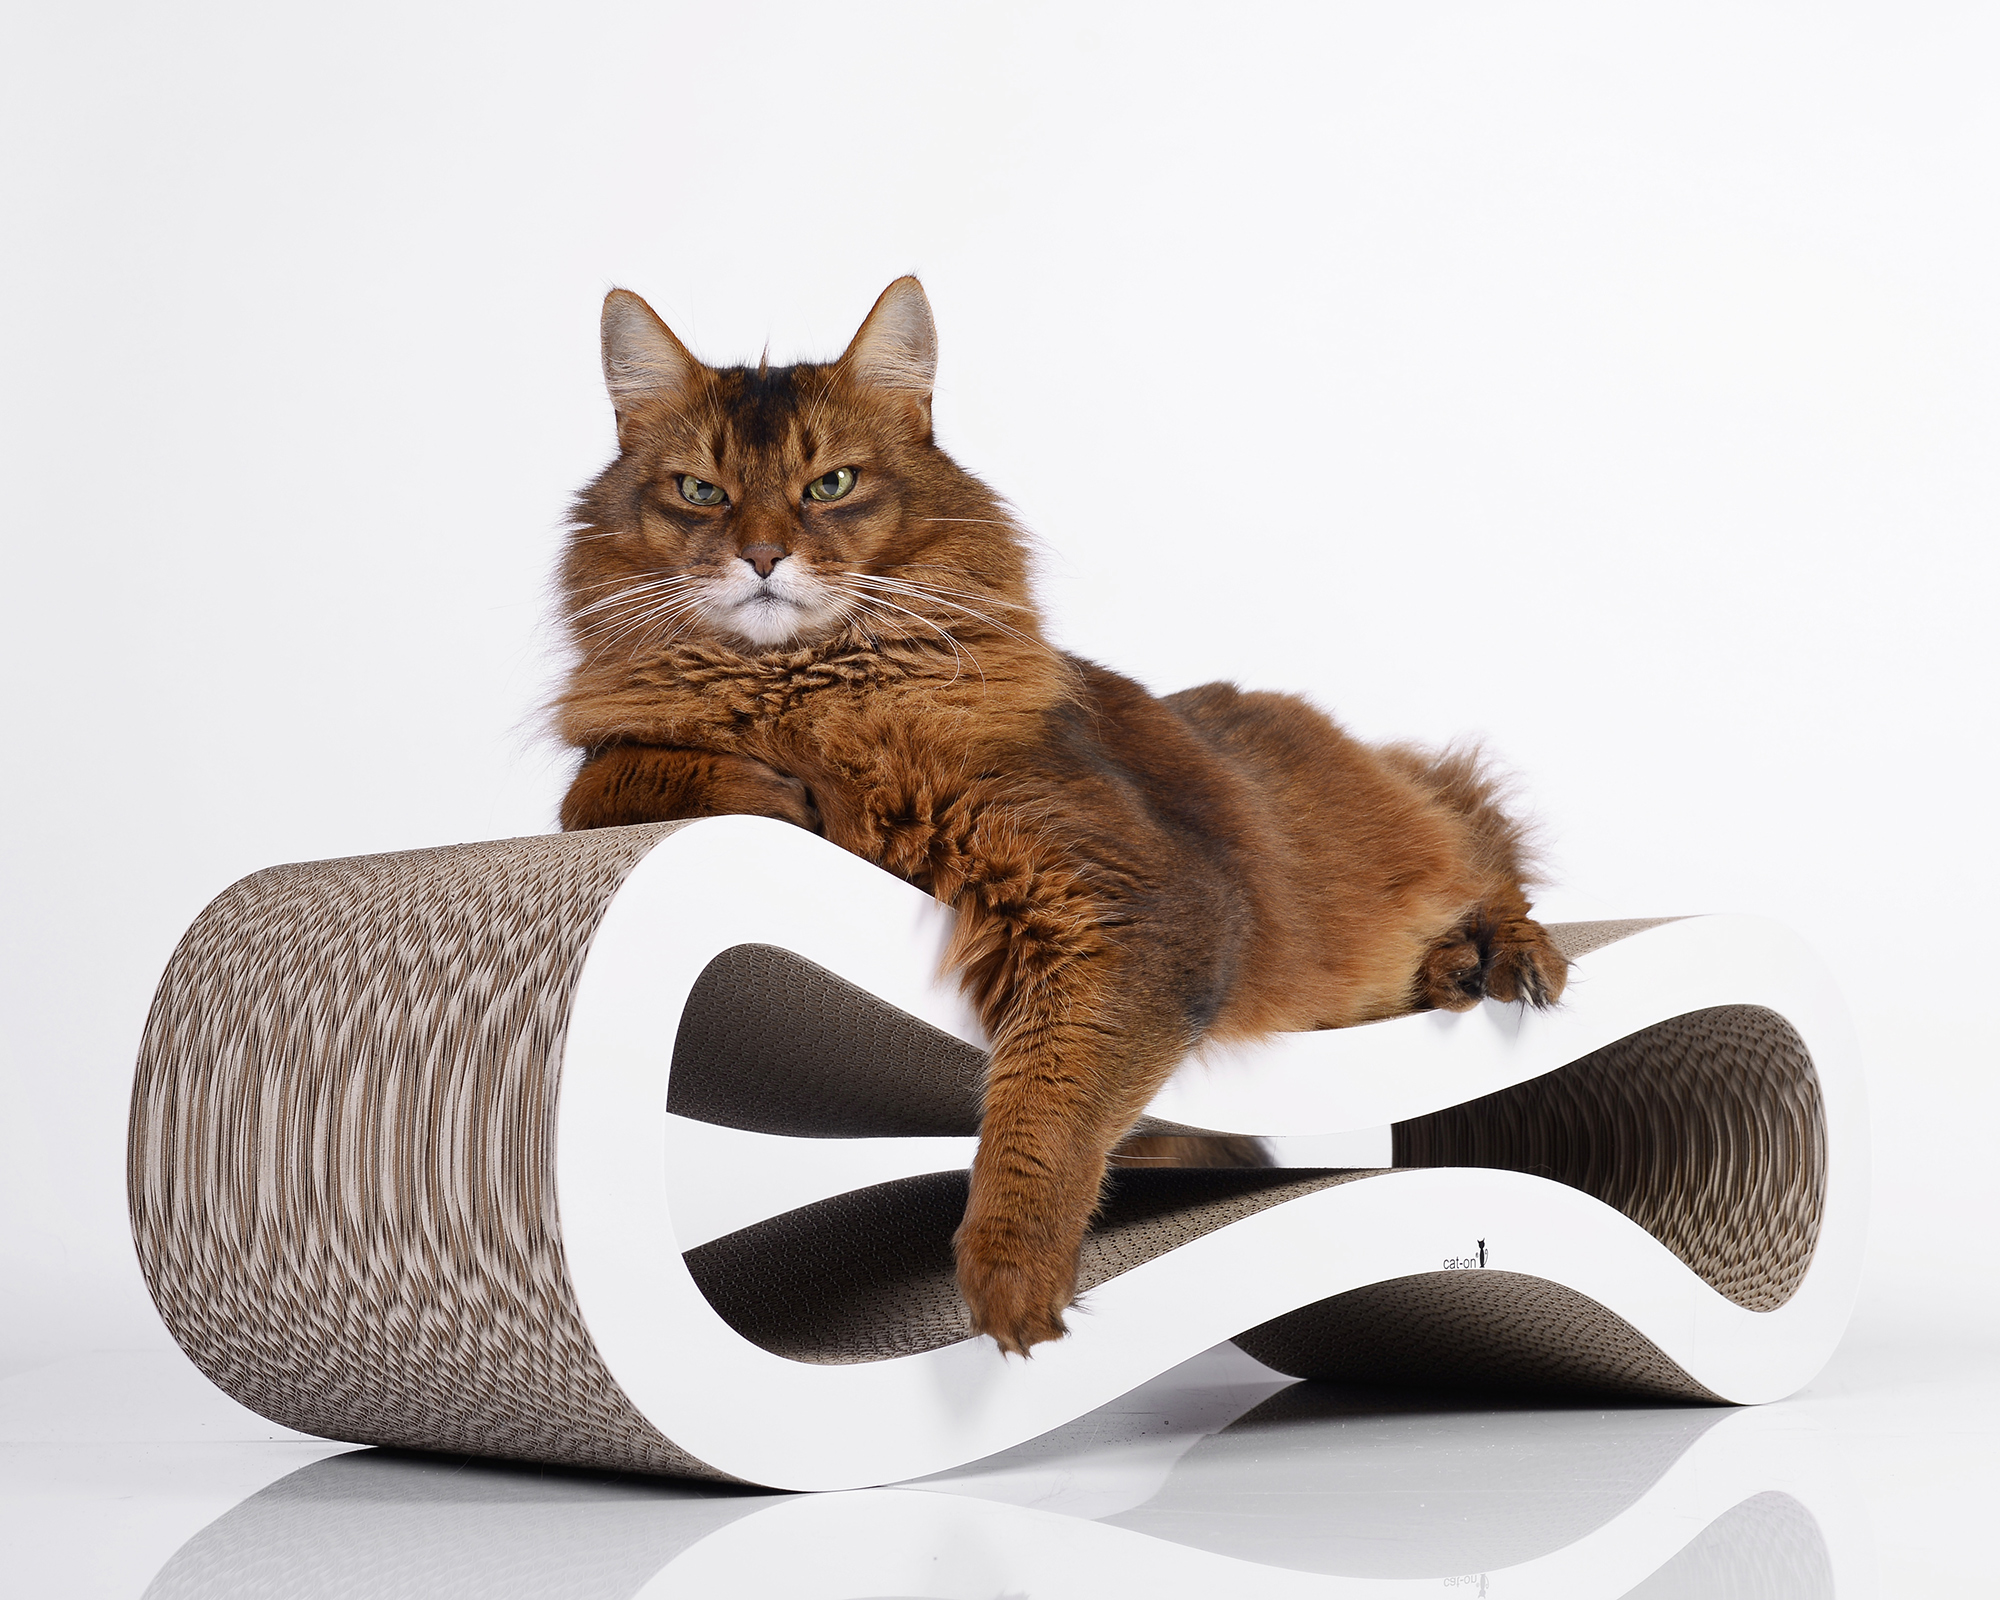 Cat Racer cat scratcher